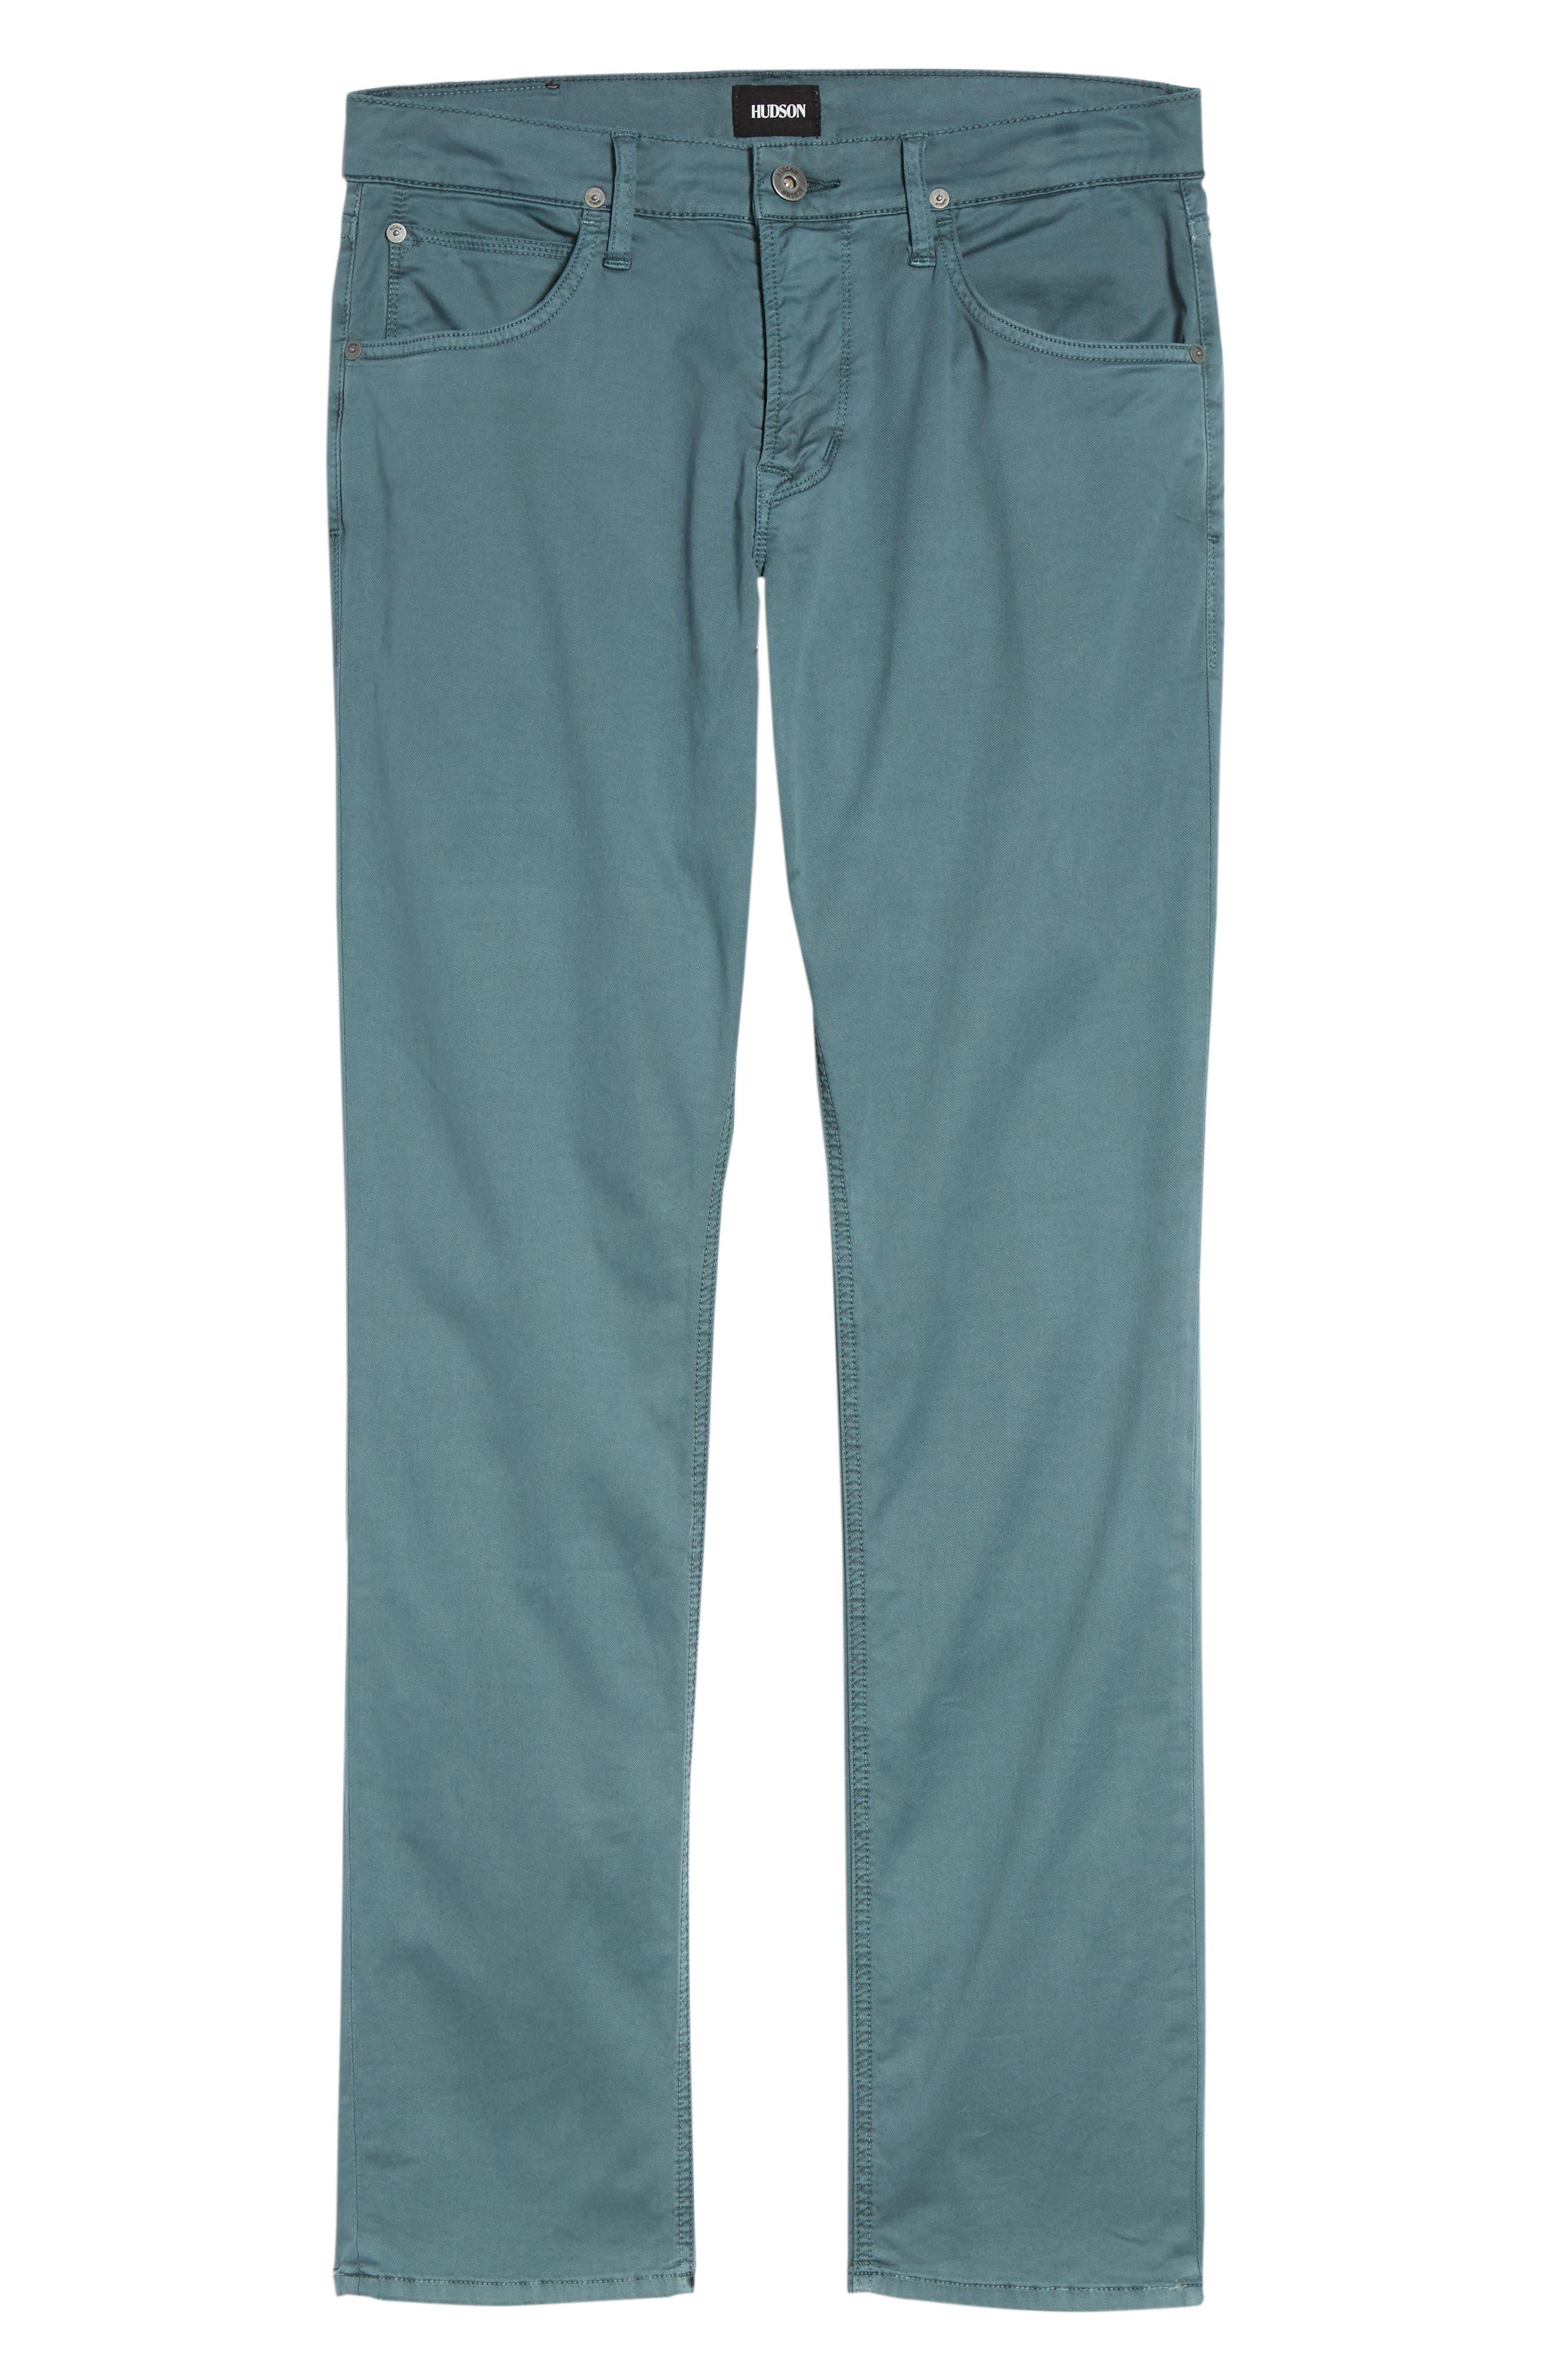 Blake Slim Fit Jeans,                             Alternate thumbnail 6, color,                             Ocean